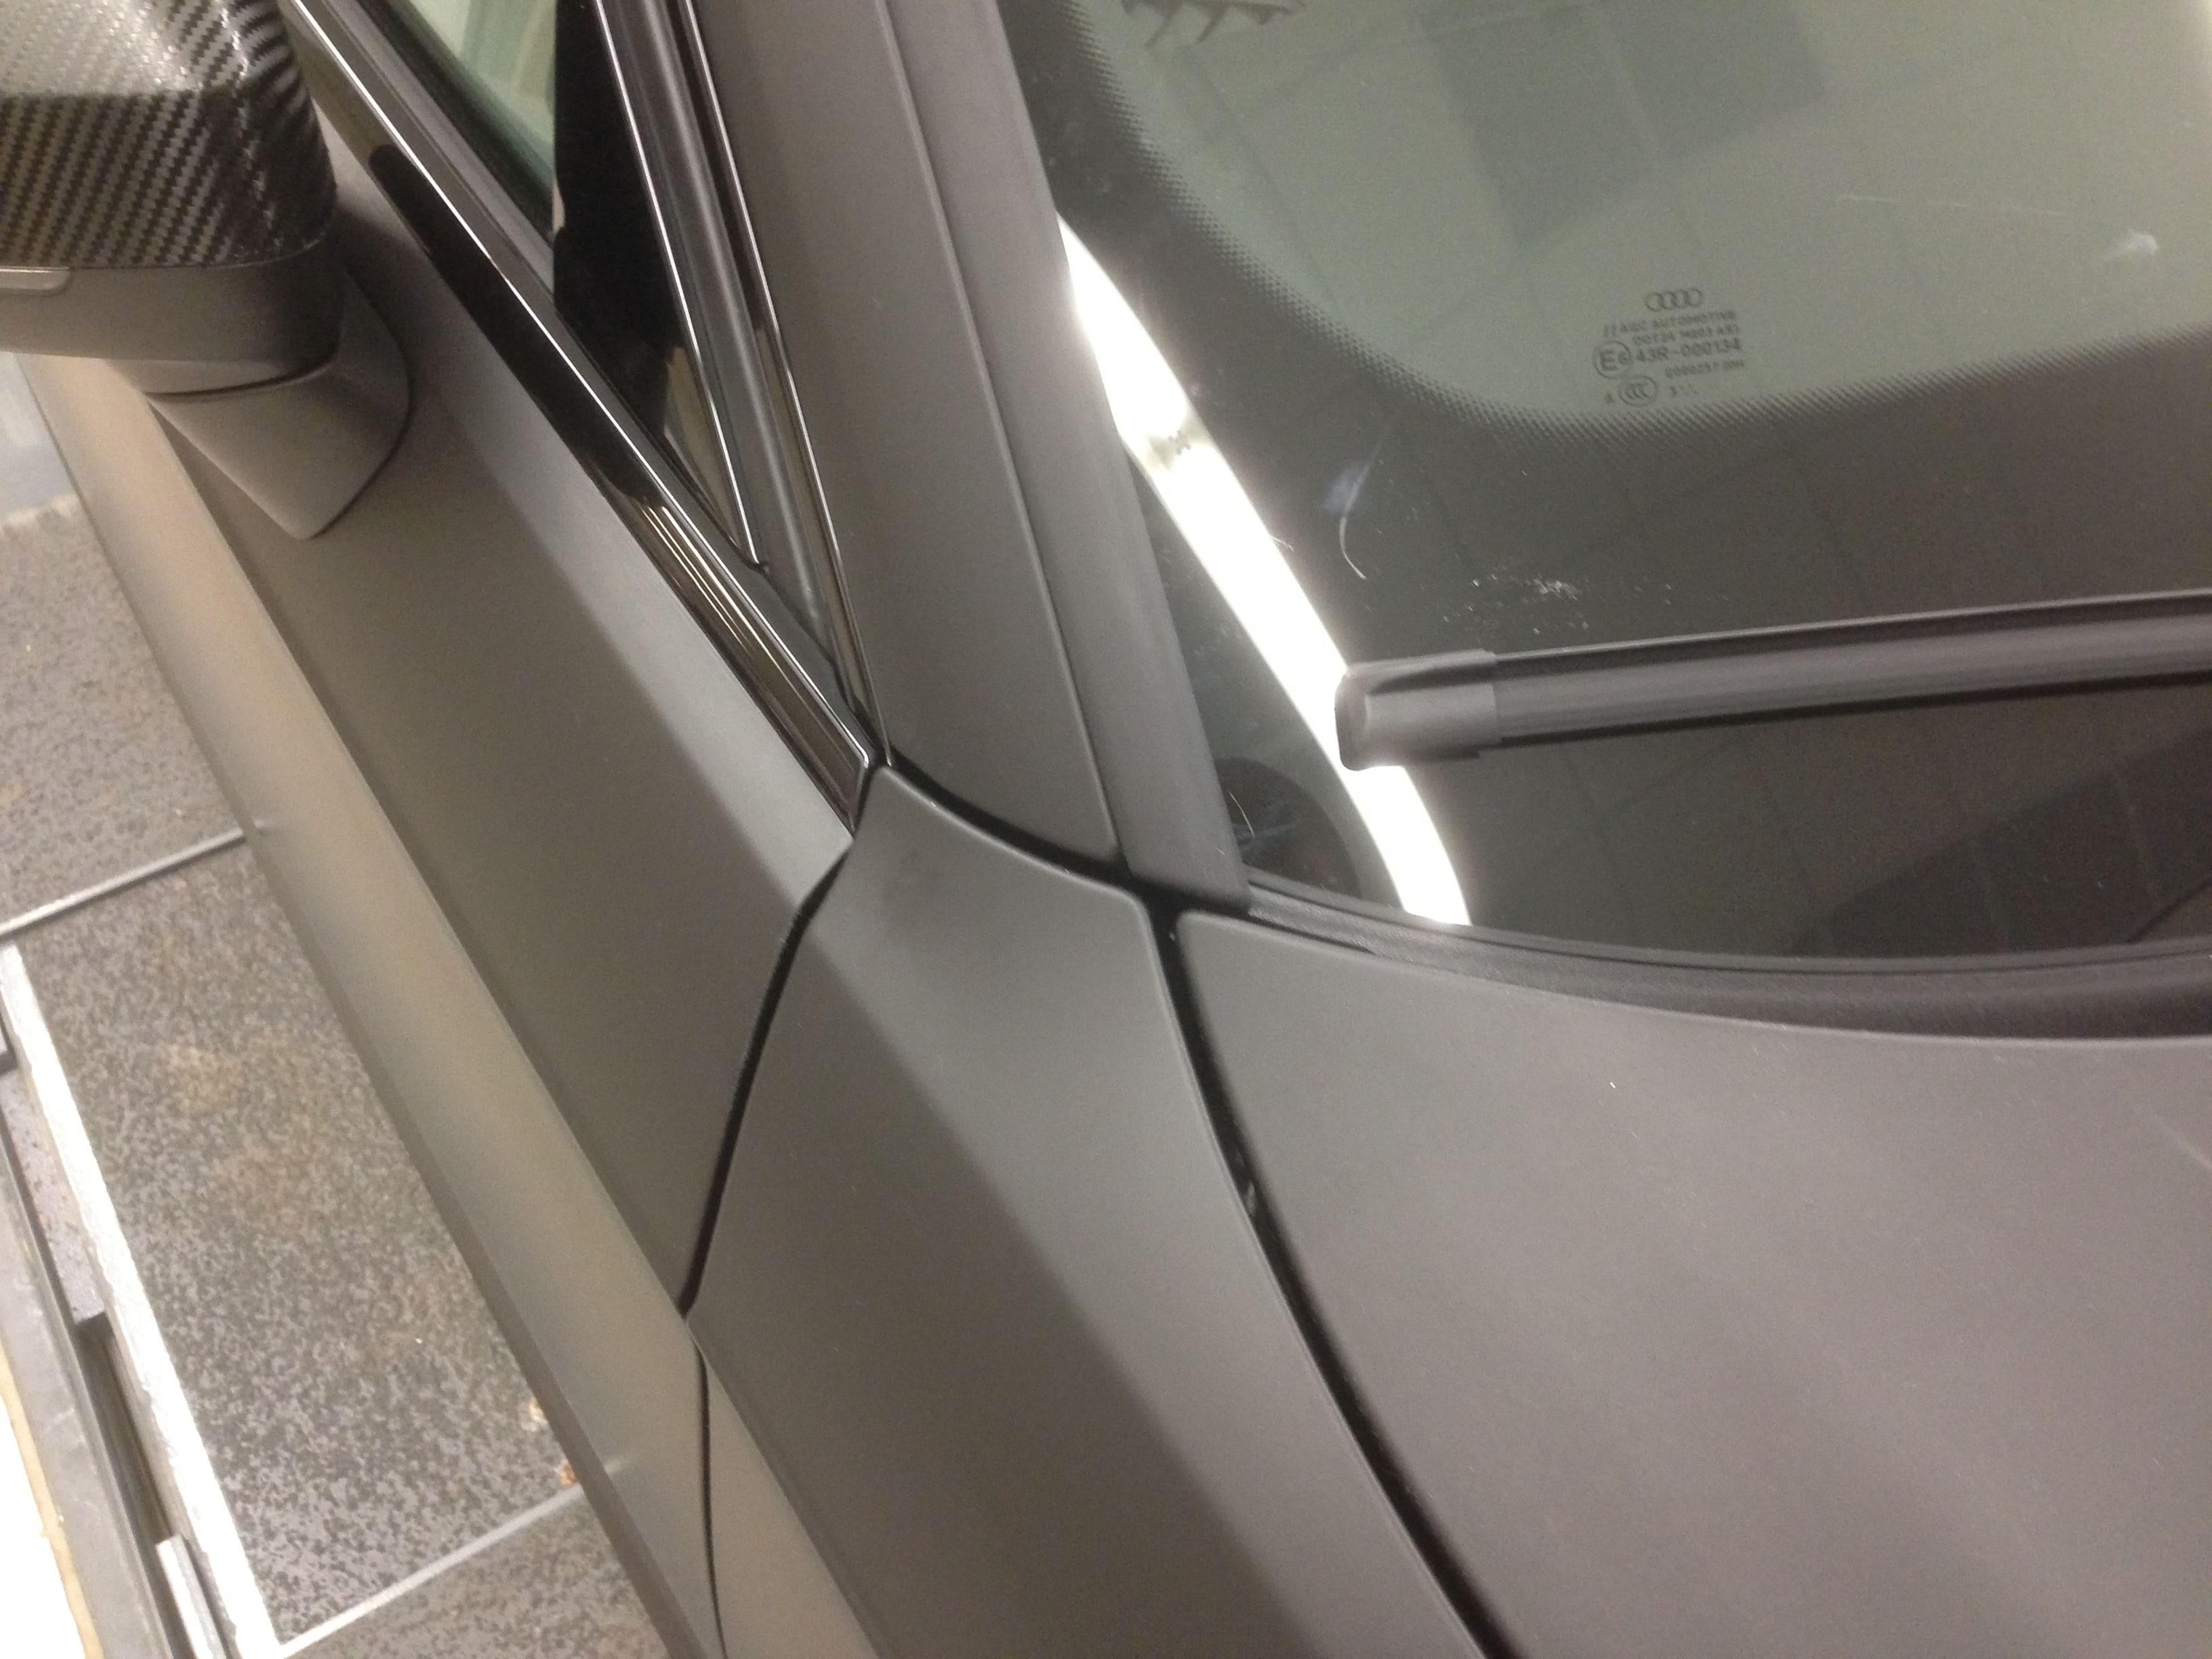 Audi A3 2014 met Mat Zwarte Wrap, Carwrapping door Wrapmyride.nu Foto-nr:4467, ©2021